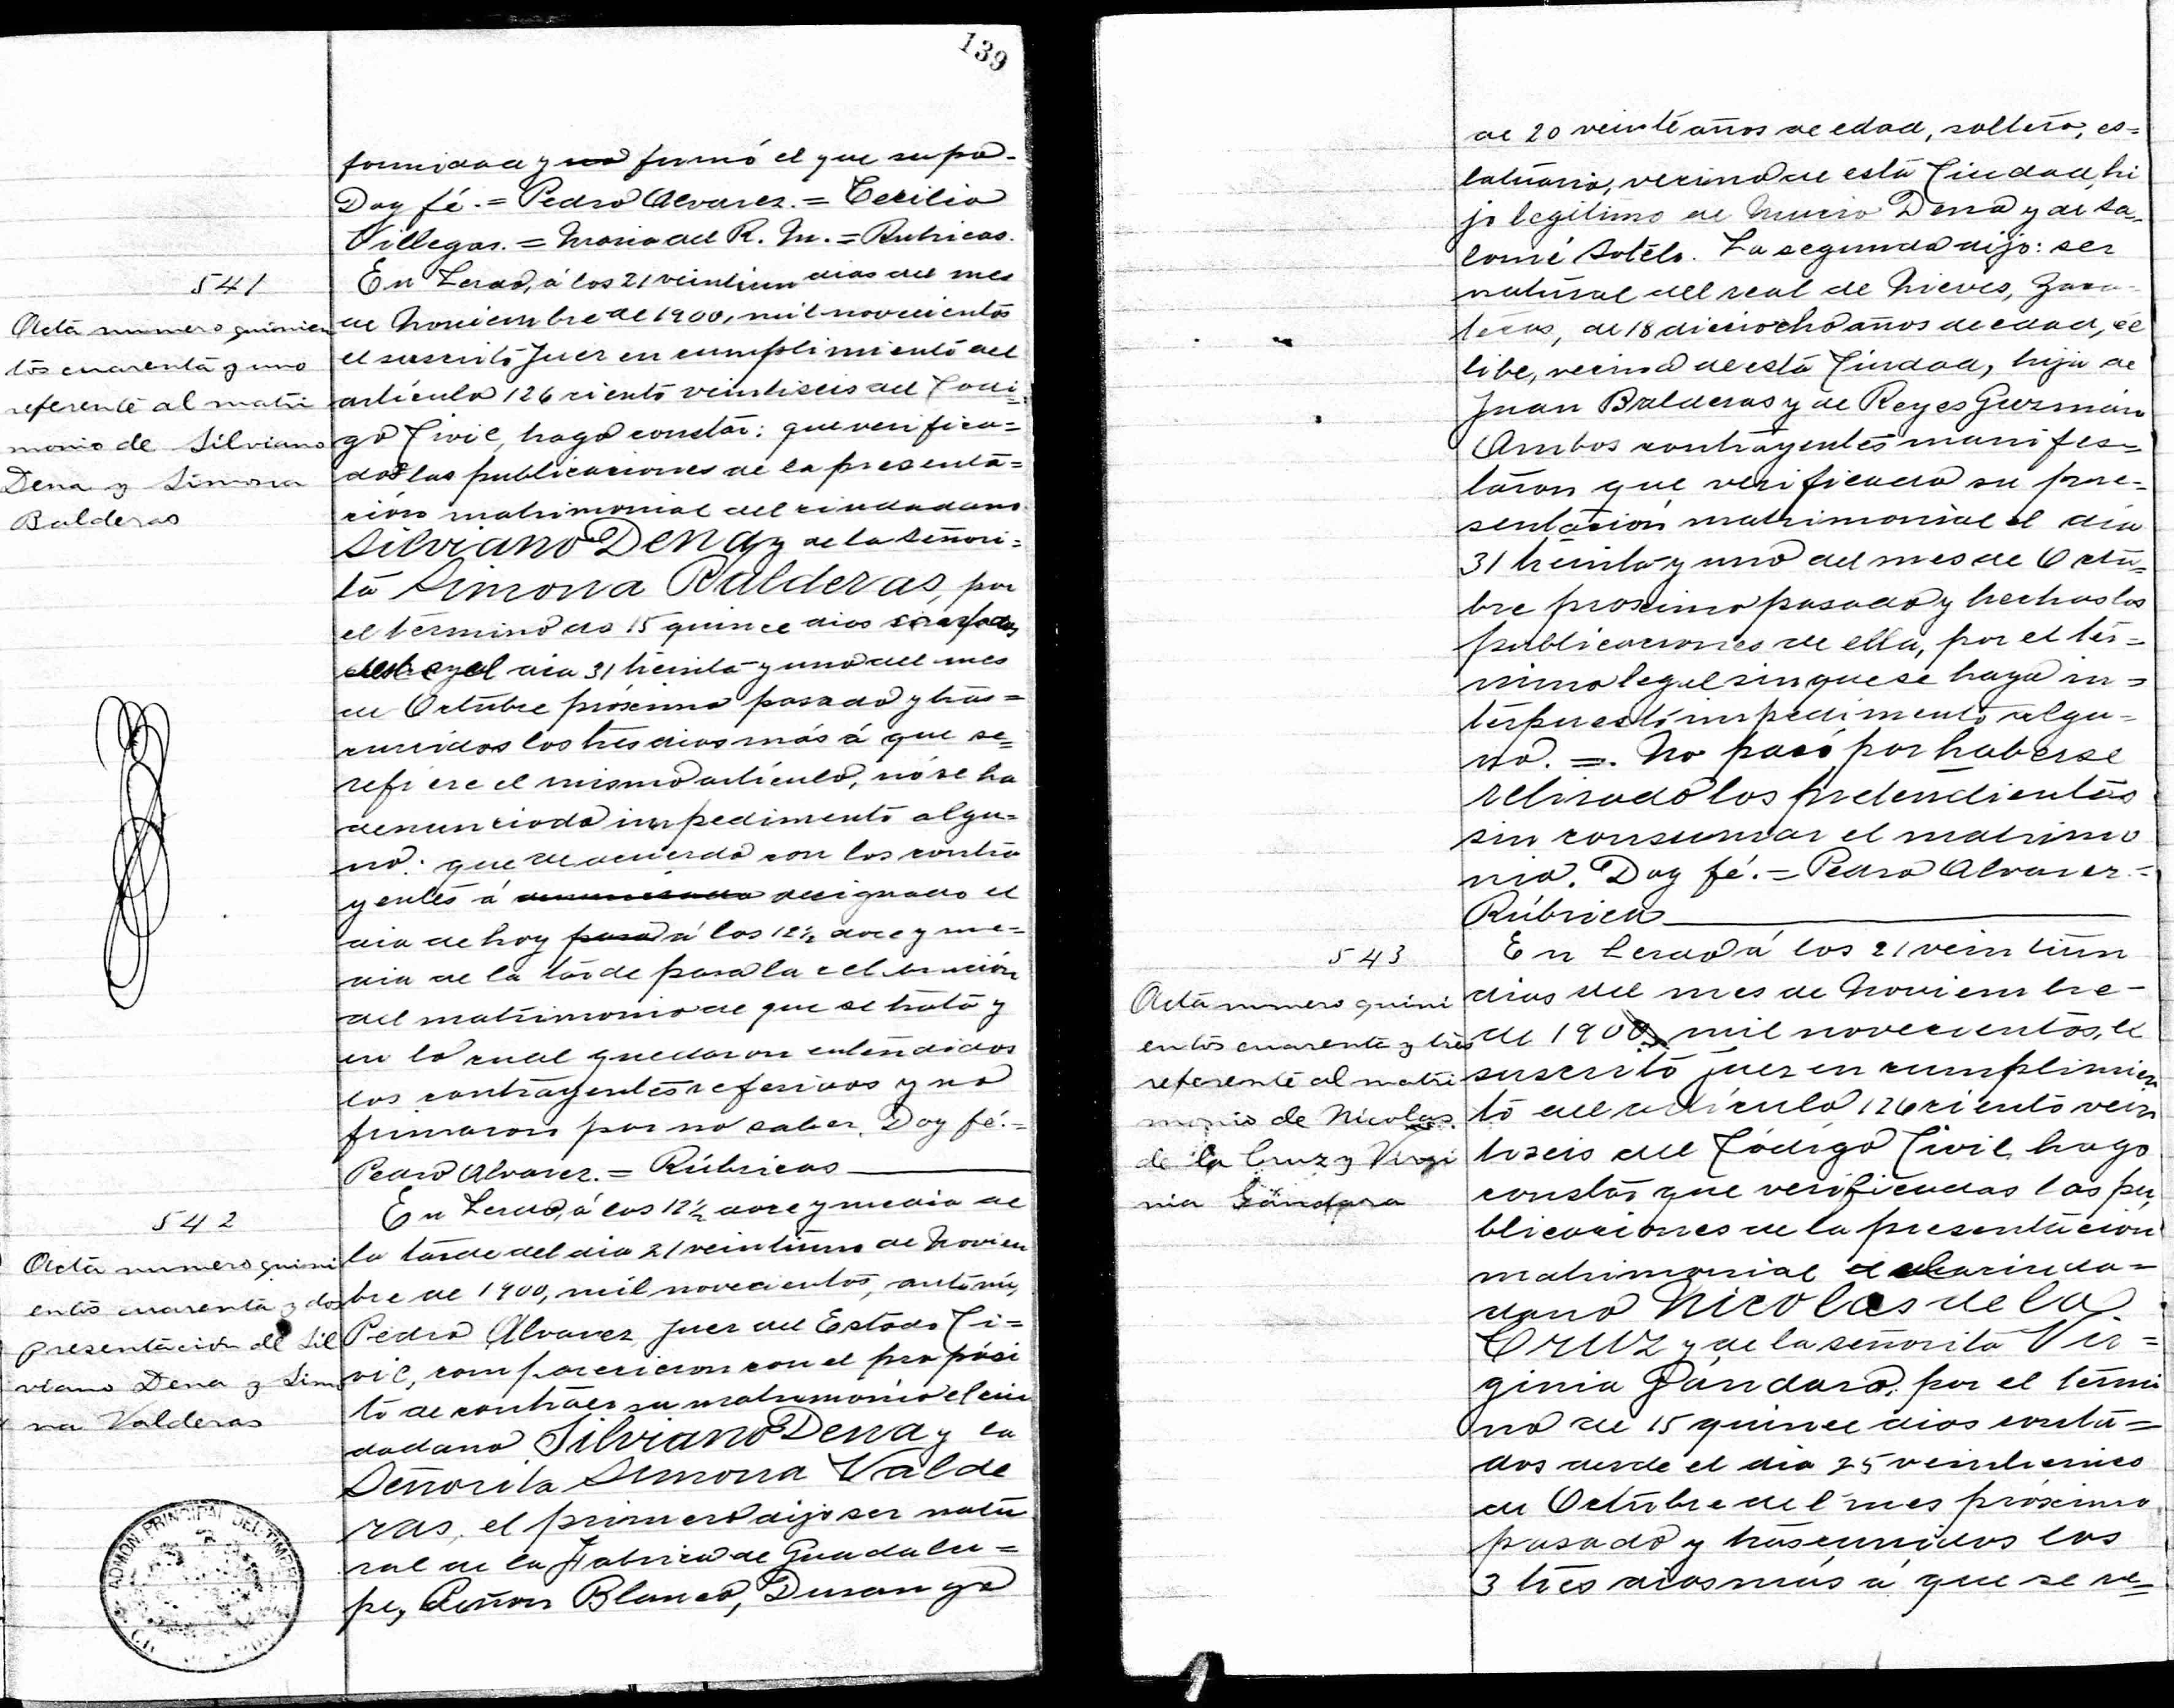 Lerdo marriage record of Silviano Dena and Simona Balderas